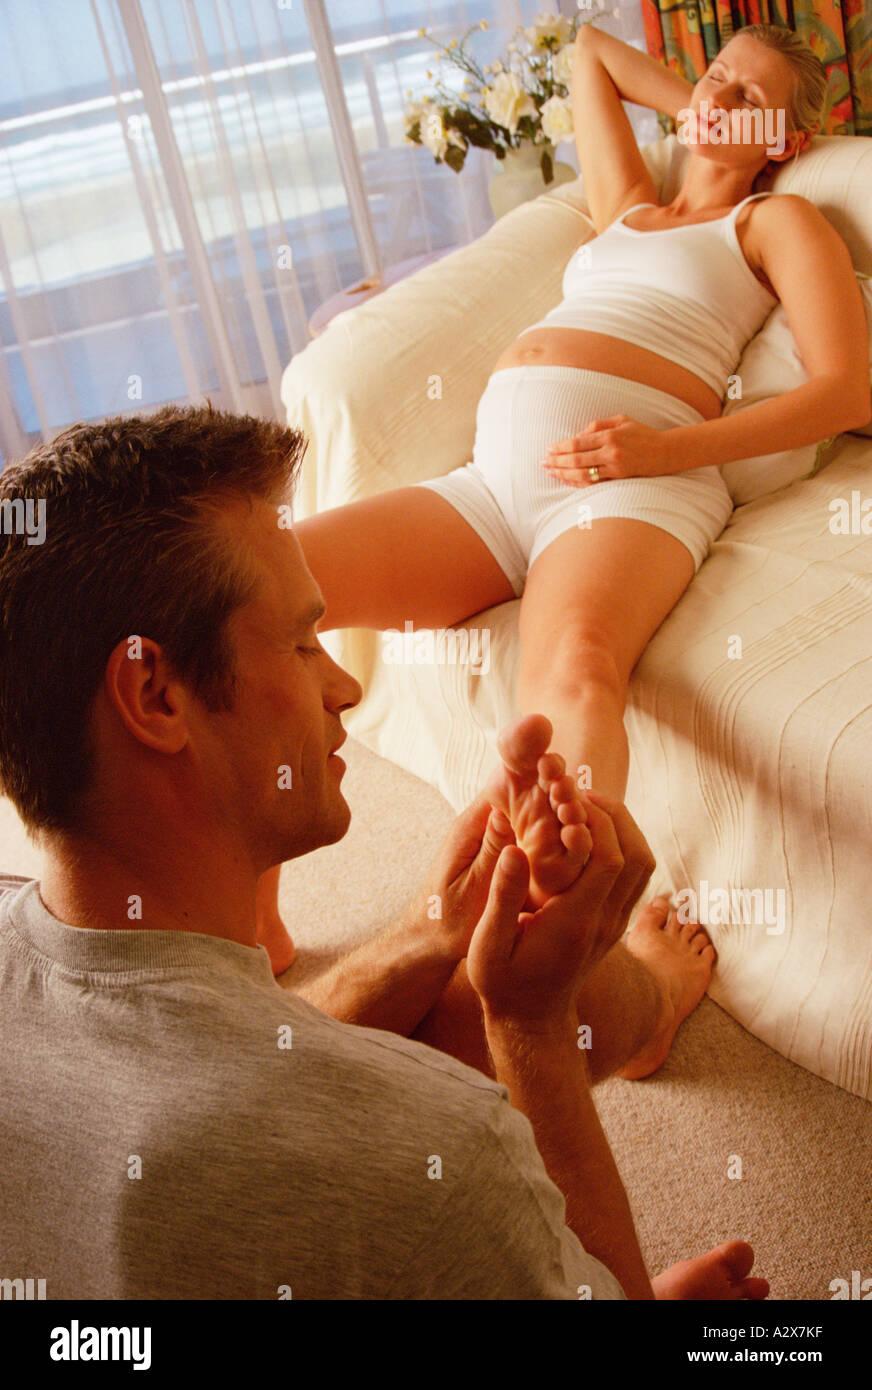 Massaging my wife in hawaii - 1 part 4